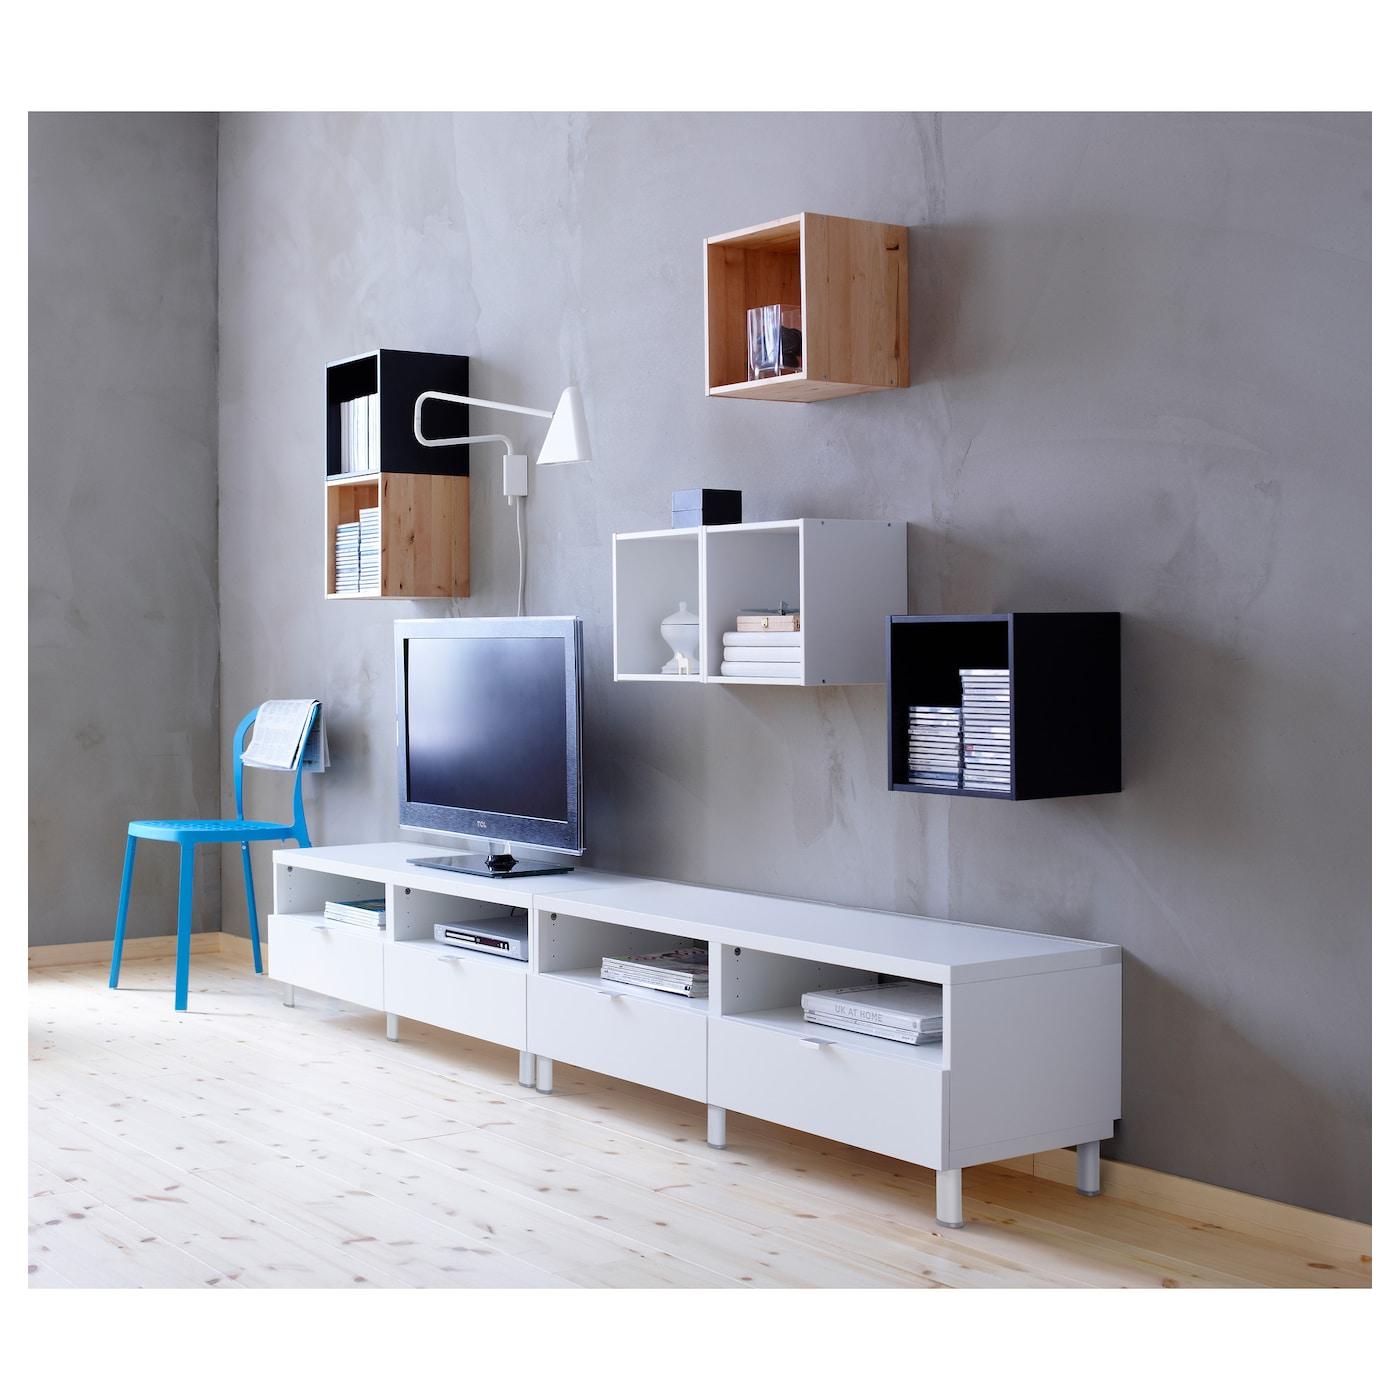 Panneau Mural Tv Ikea - Panneau Mural Tv Ikea Fenrez Com Sammlung Von Design [mjhdah]http://www.ikea.com/be/fr/images/products/best%C3%A5-burs-banc-tv-brillant-blanc__0257776_pe402056_s5.jpg